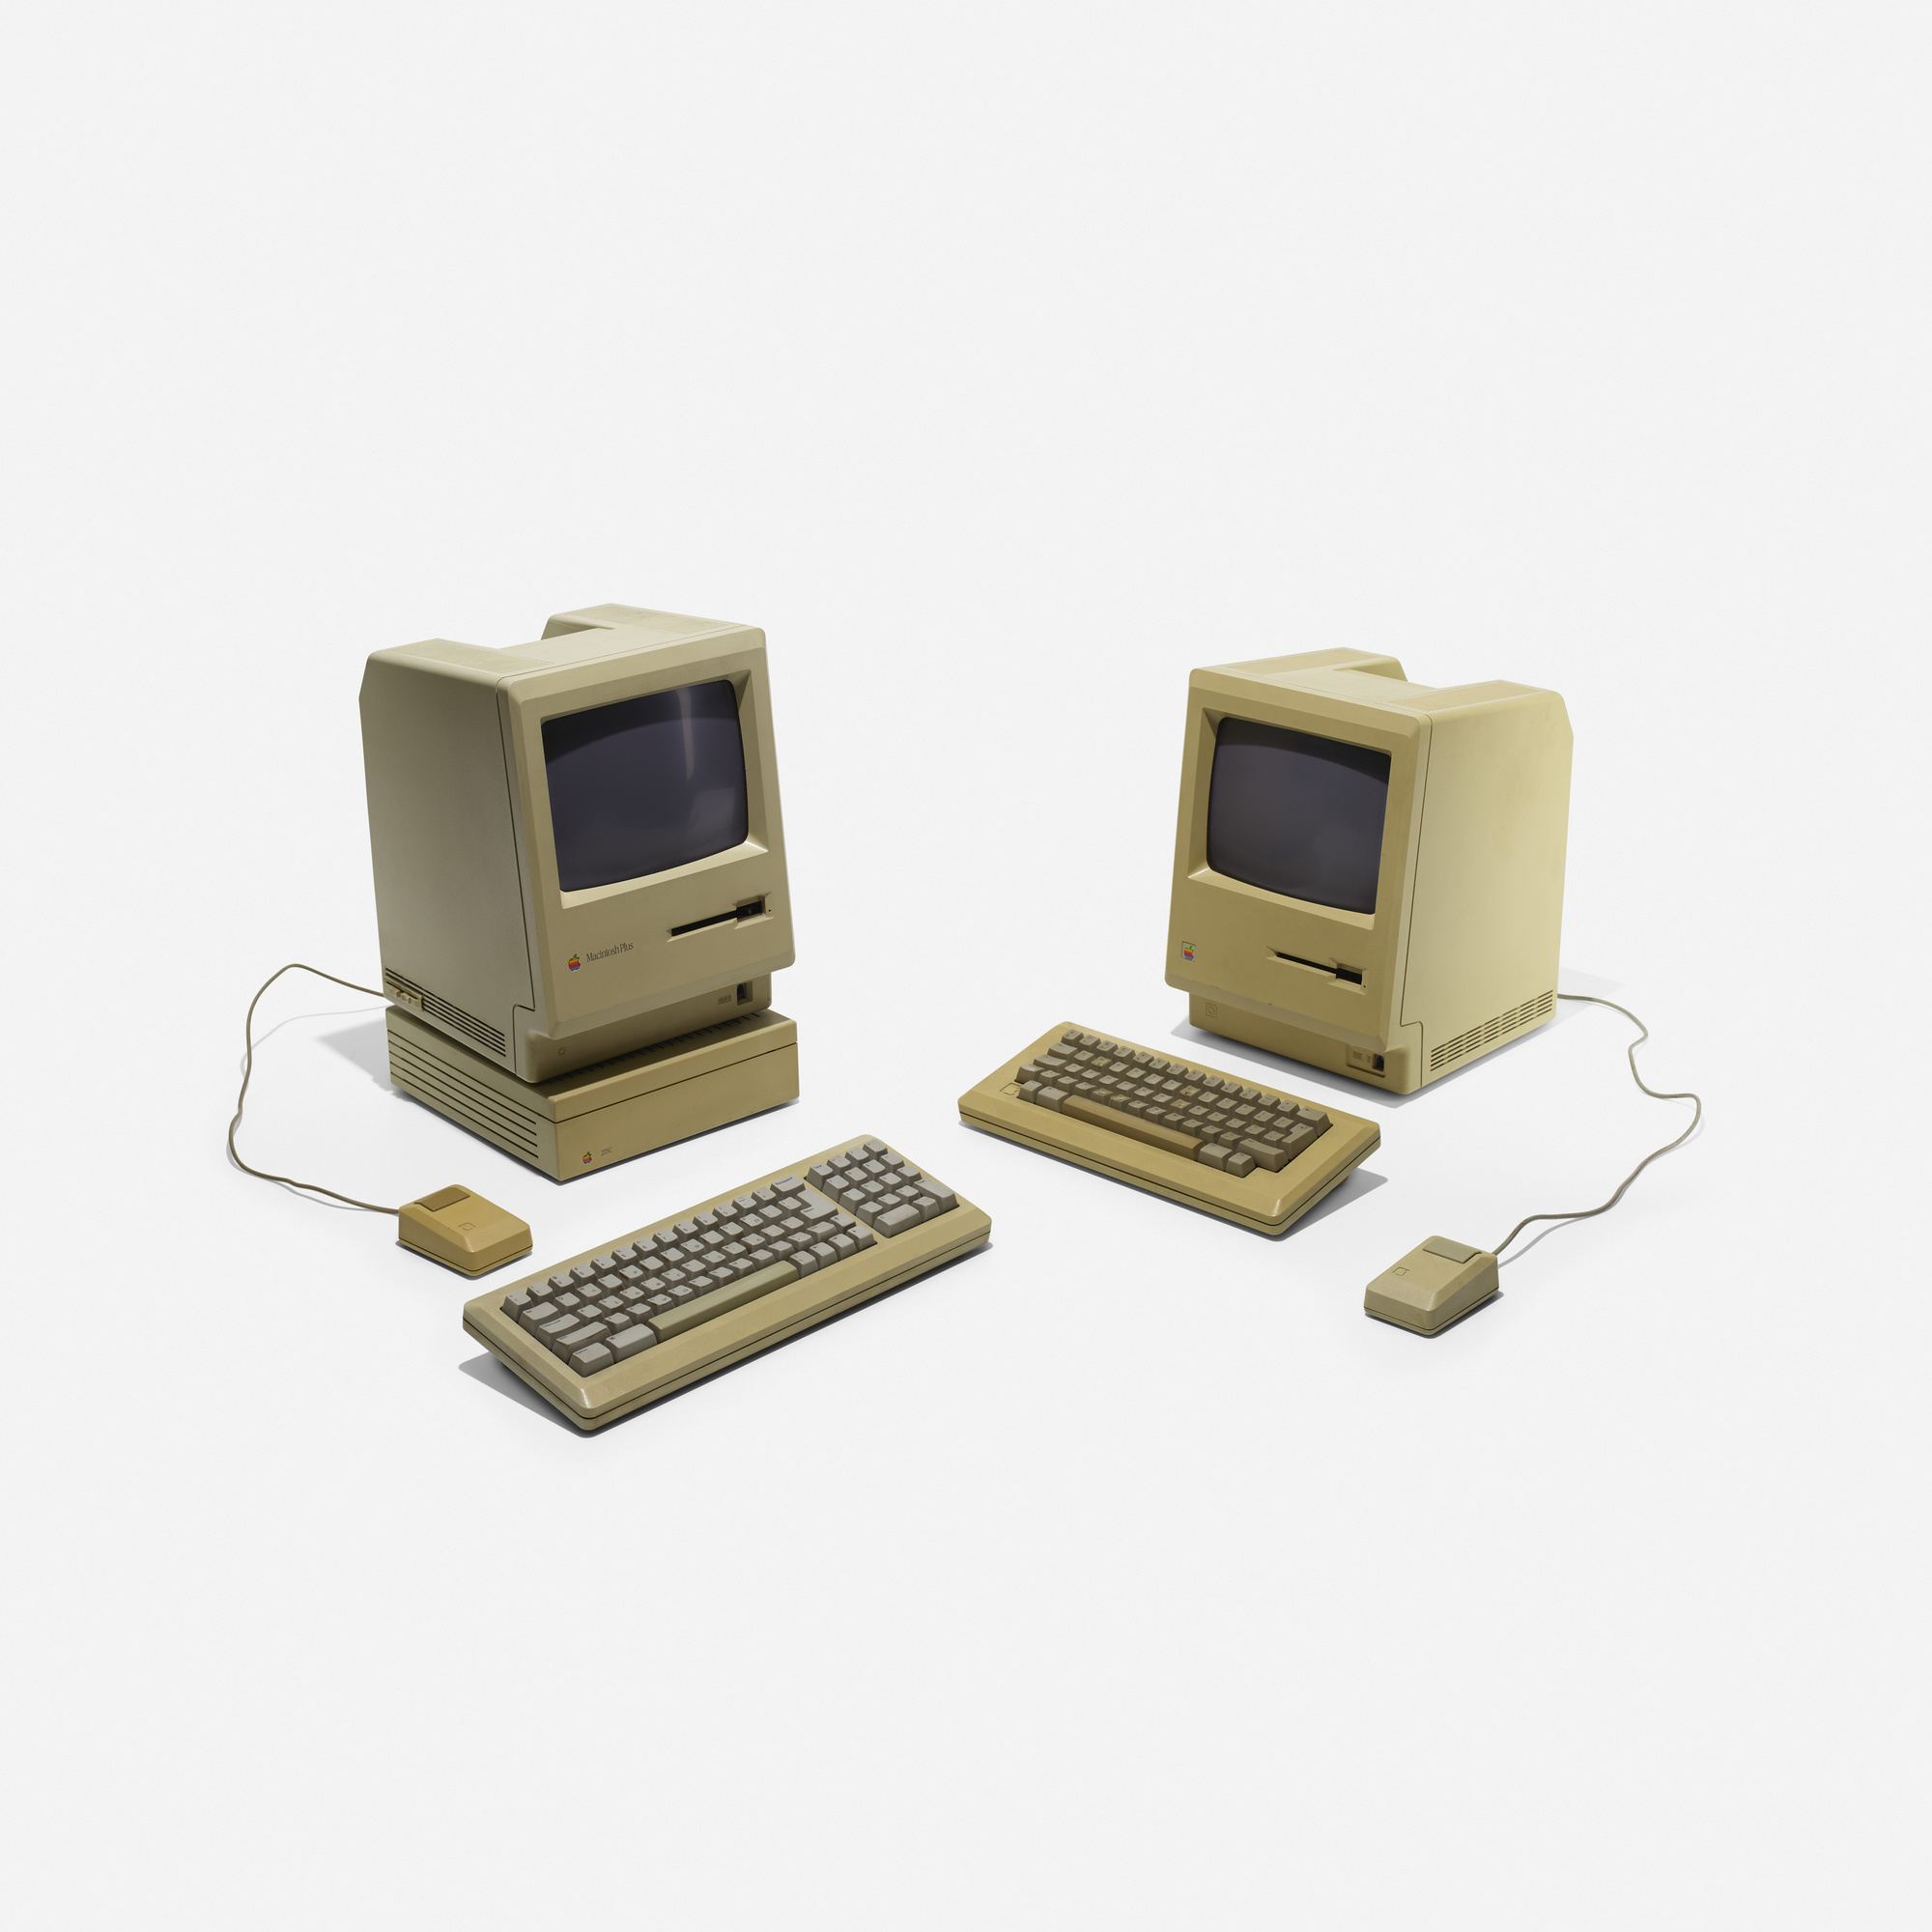 131: Frog Design / Apple Macintosh 512K Personal Computers, pair (1 of 2)